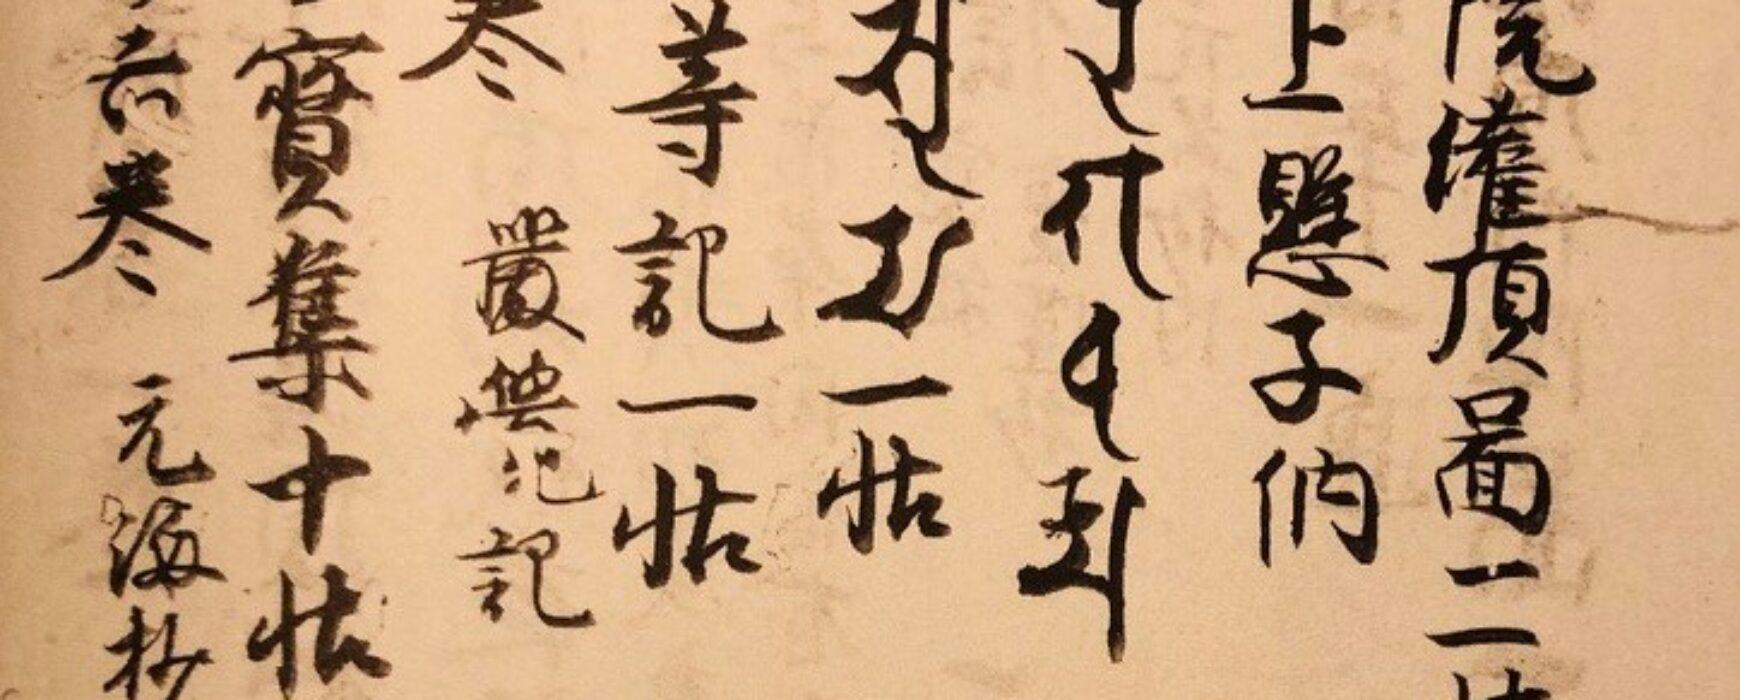 Guest Lecture: Cataloging the Medieval Japanese Sacred Transmitted Documents (shōgyō 聖教) from Shinpukuji 真福寺 and Amanosan Kongōji 天野山金剛寺